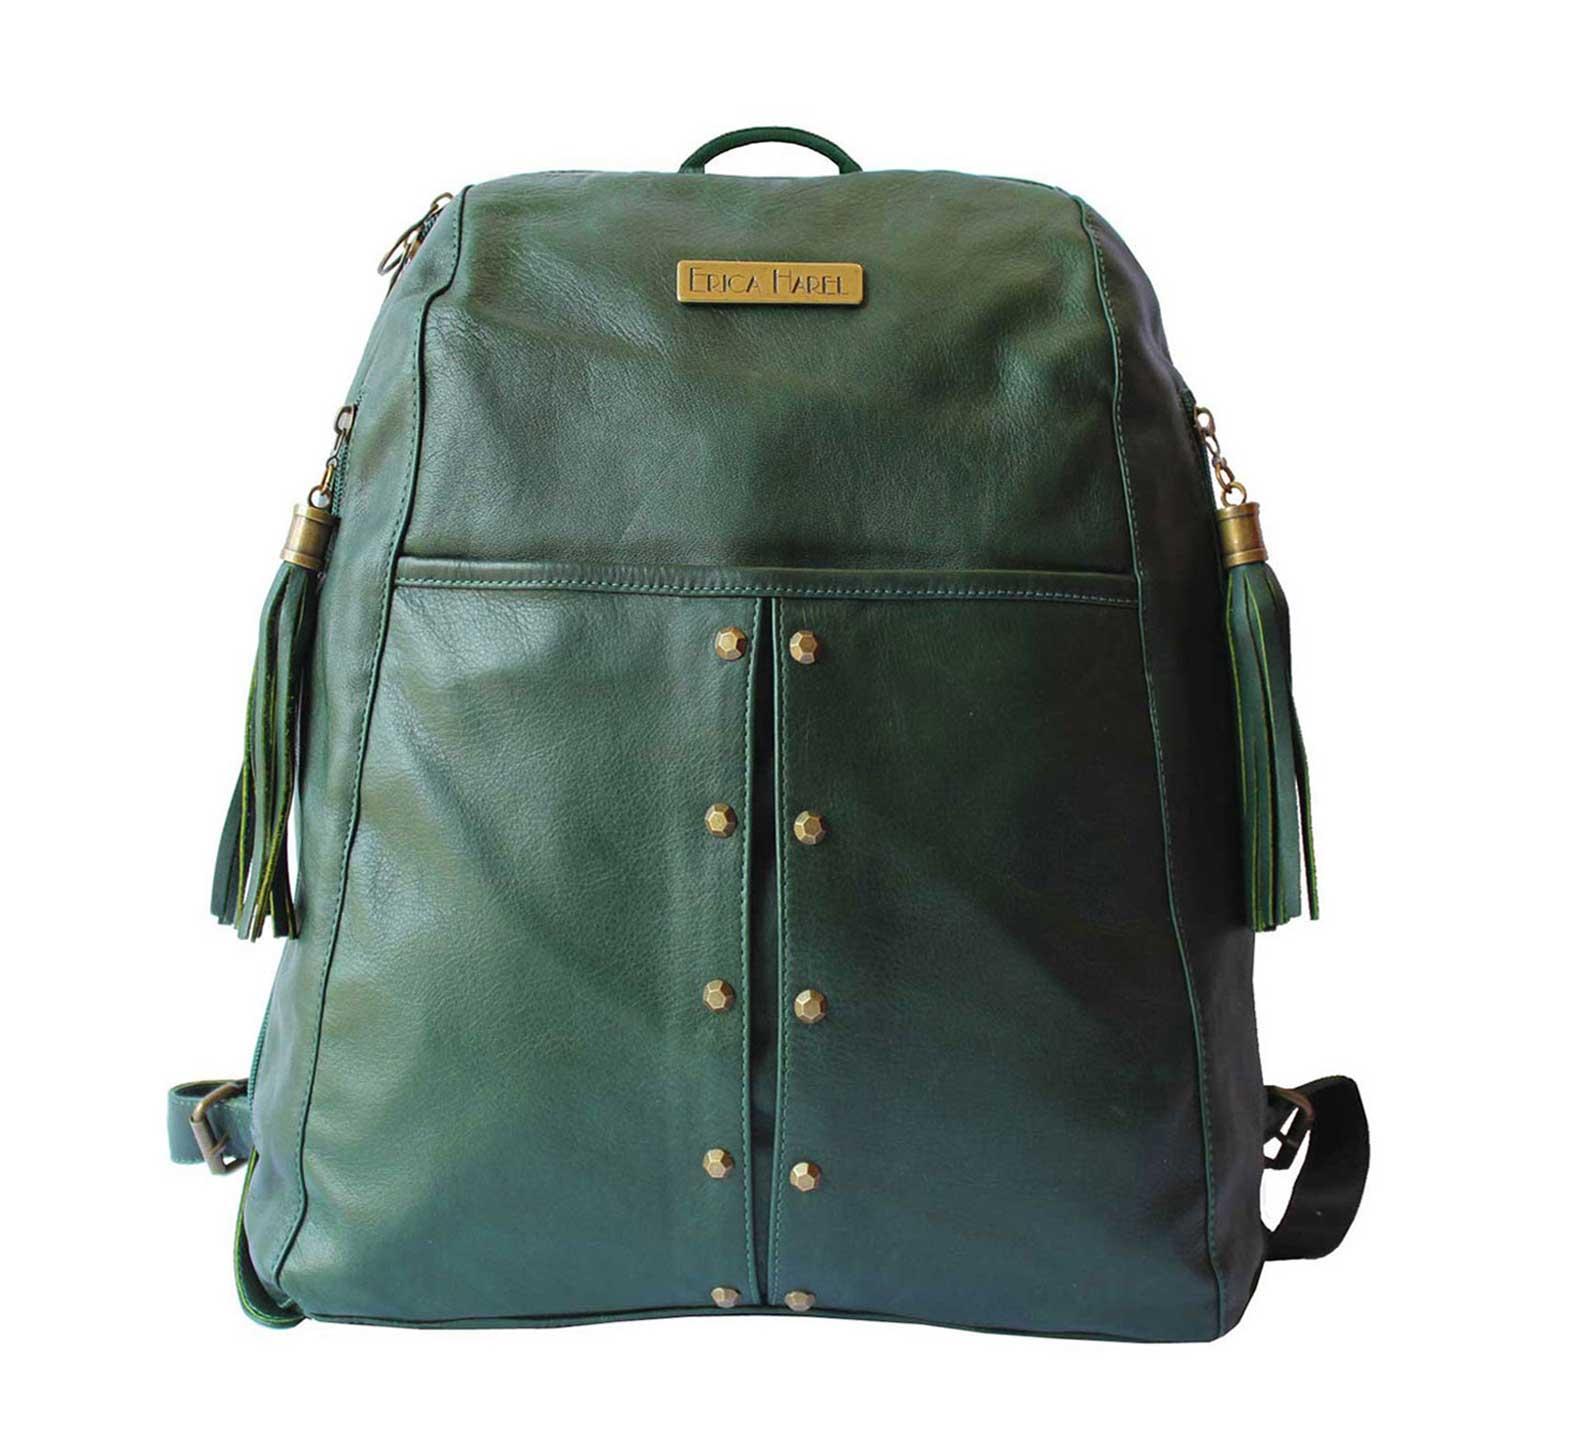 dark green soft leather backpack